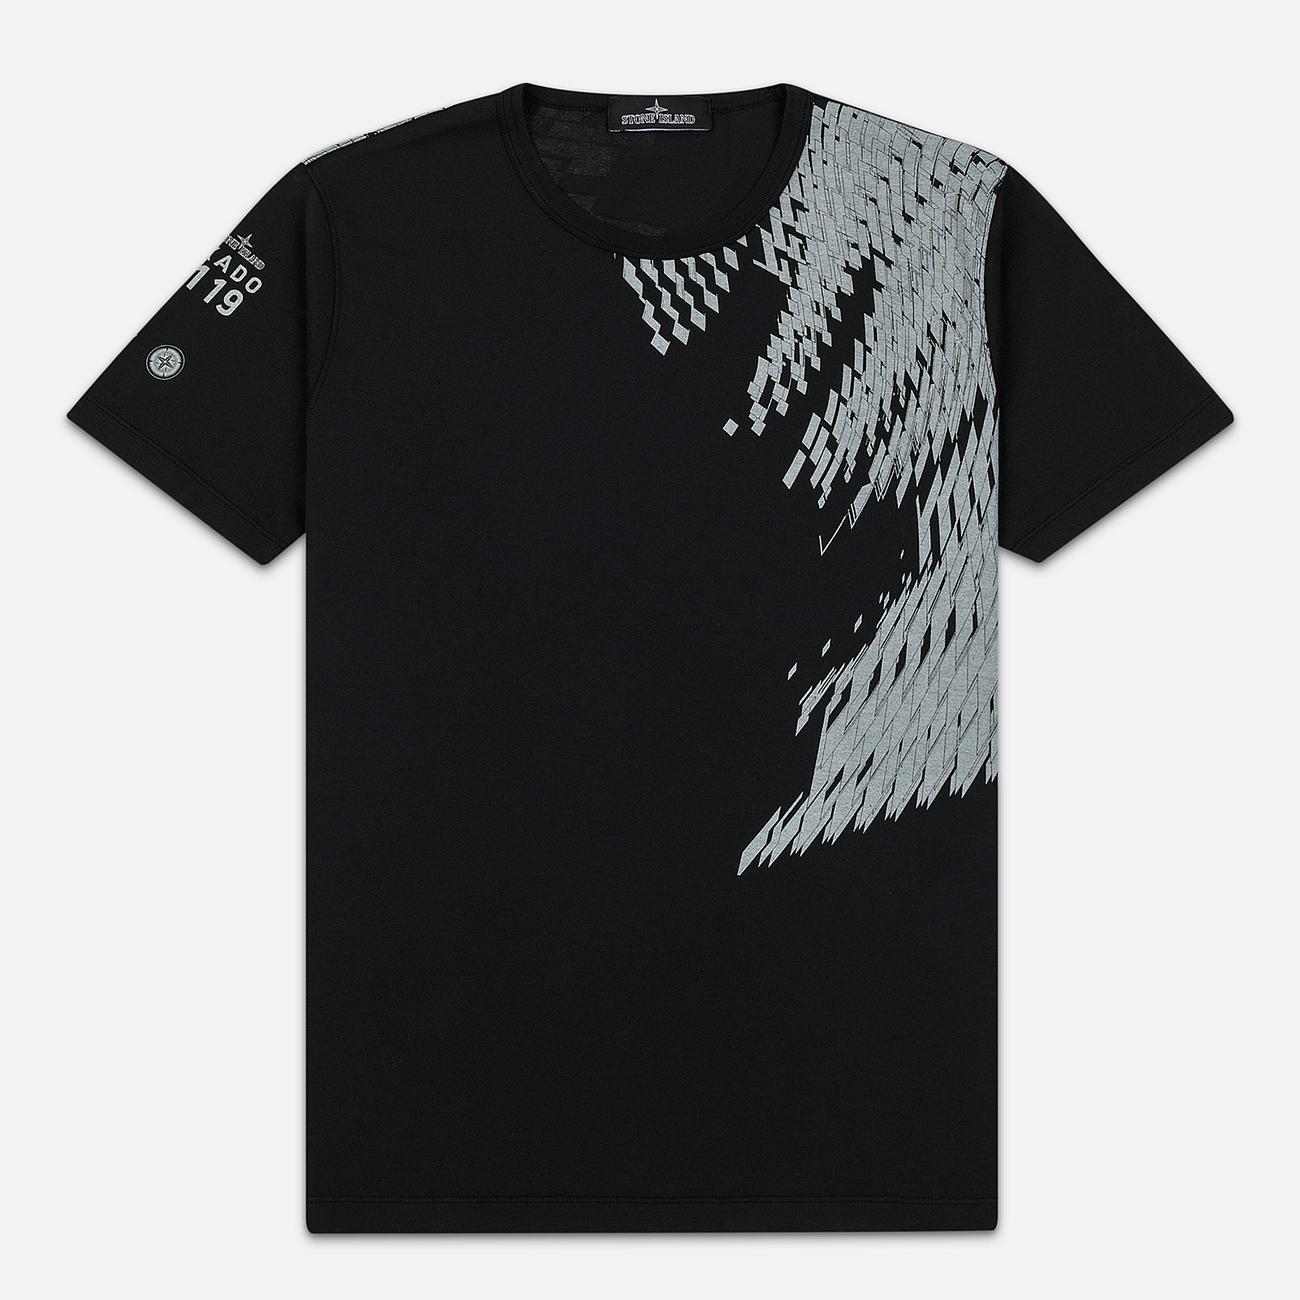 Мужская футболка Stone Island Shadow Project 7119 Print Black